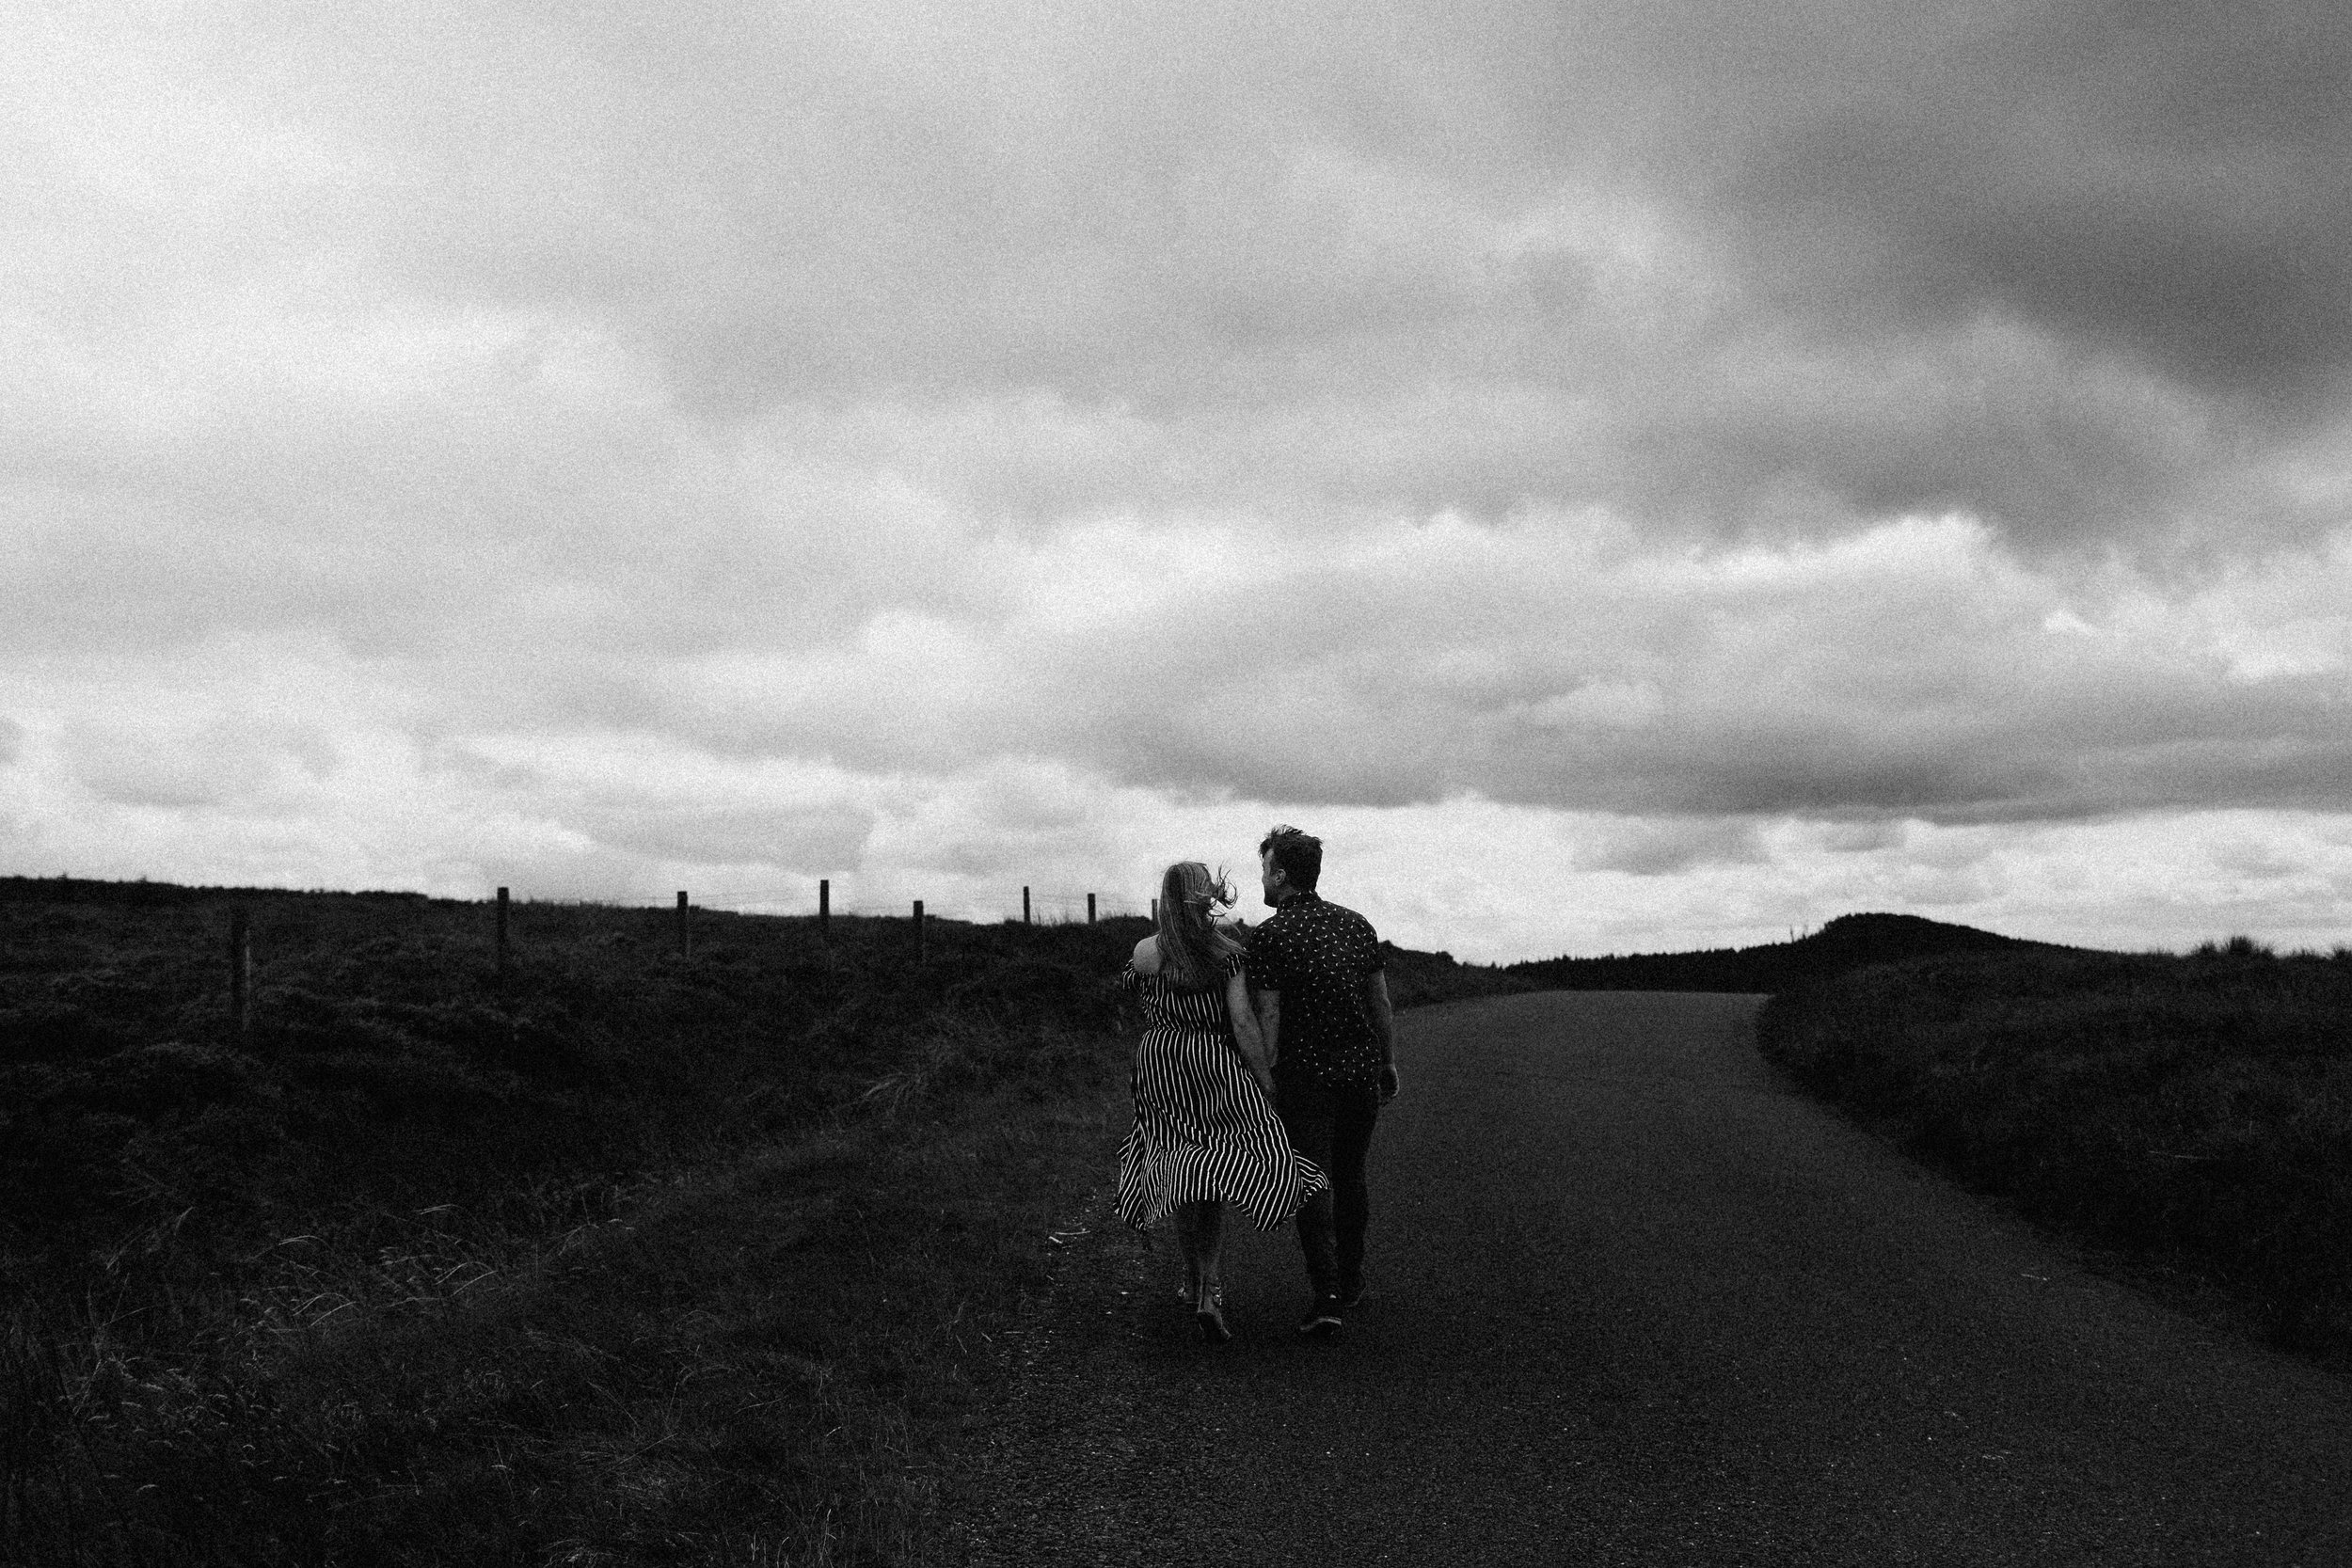 ireland_county_wicklow_glendalough_engagement_adventure_photography_windy_moody_atlanta_wedding_photographer_1159.jpg